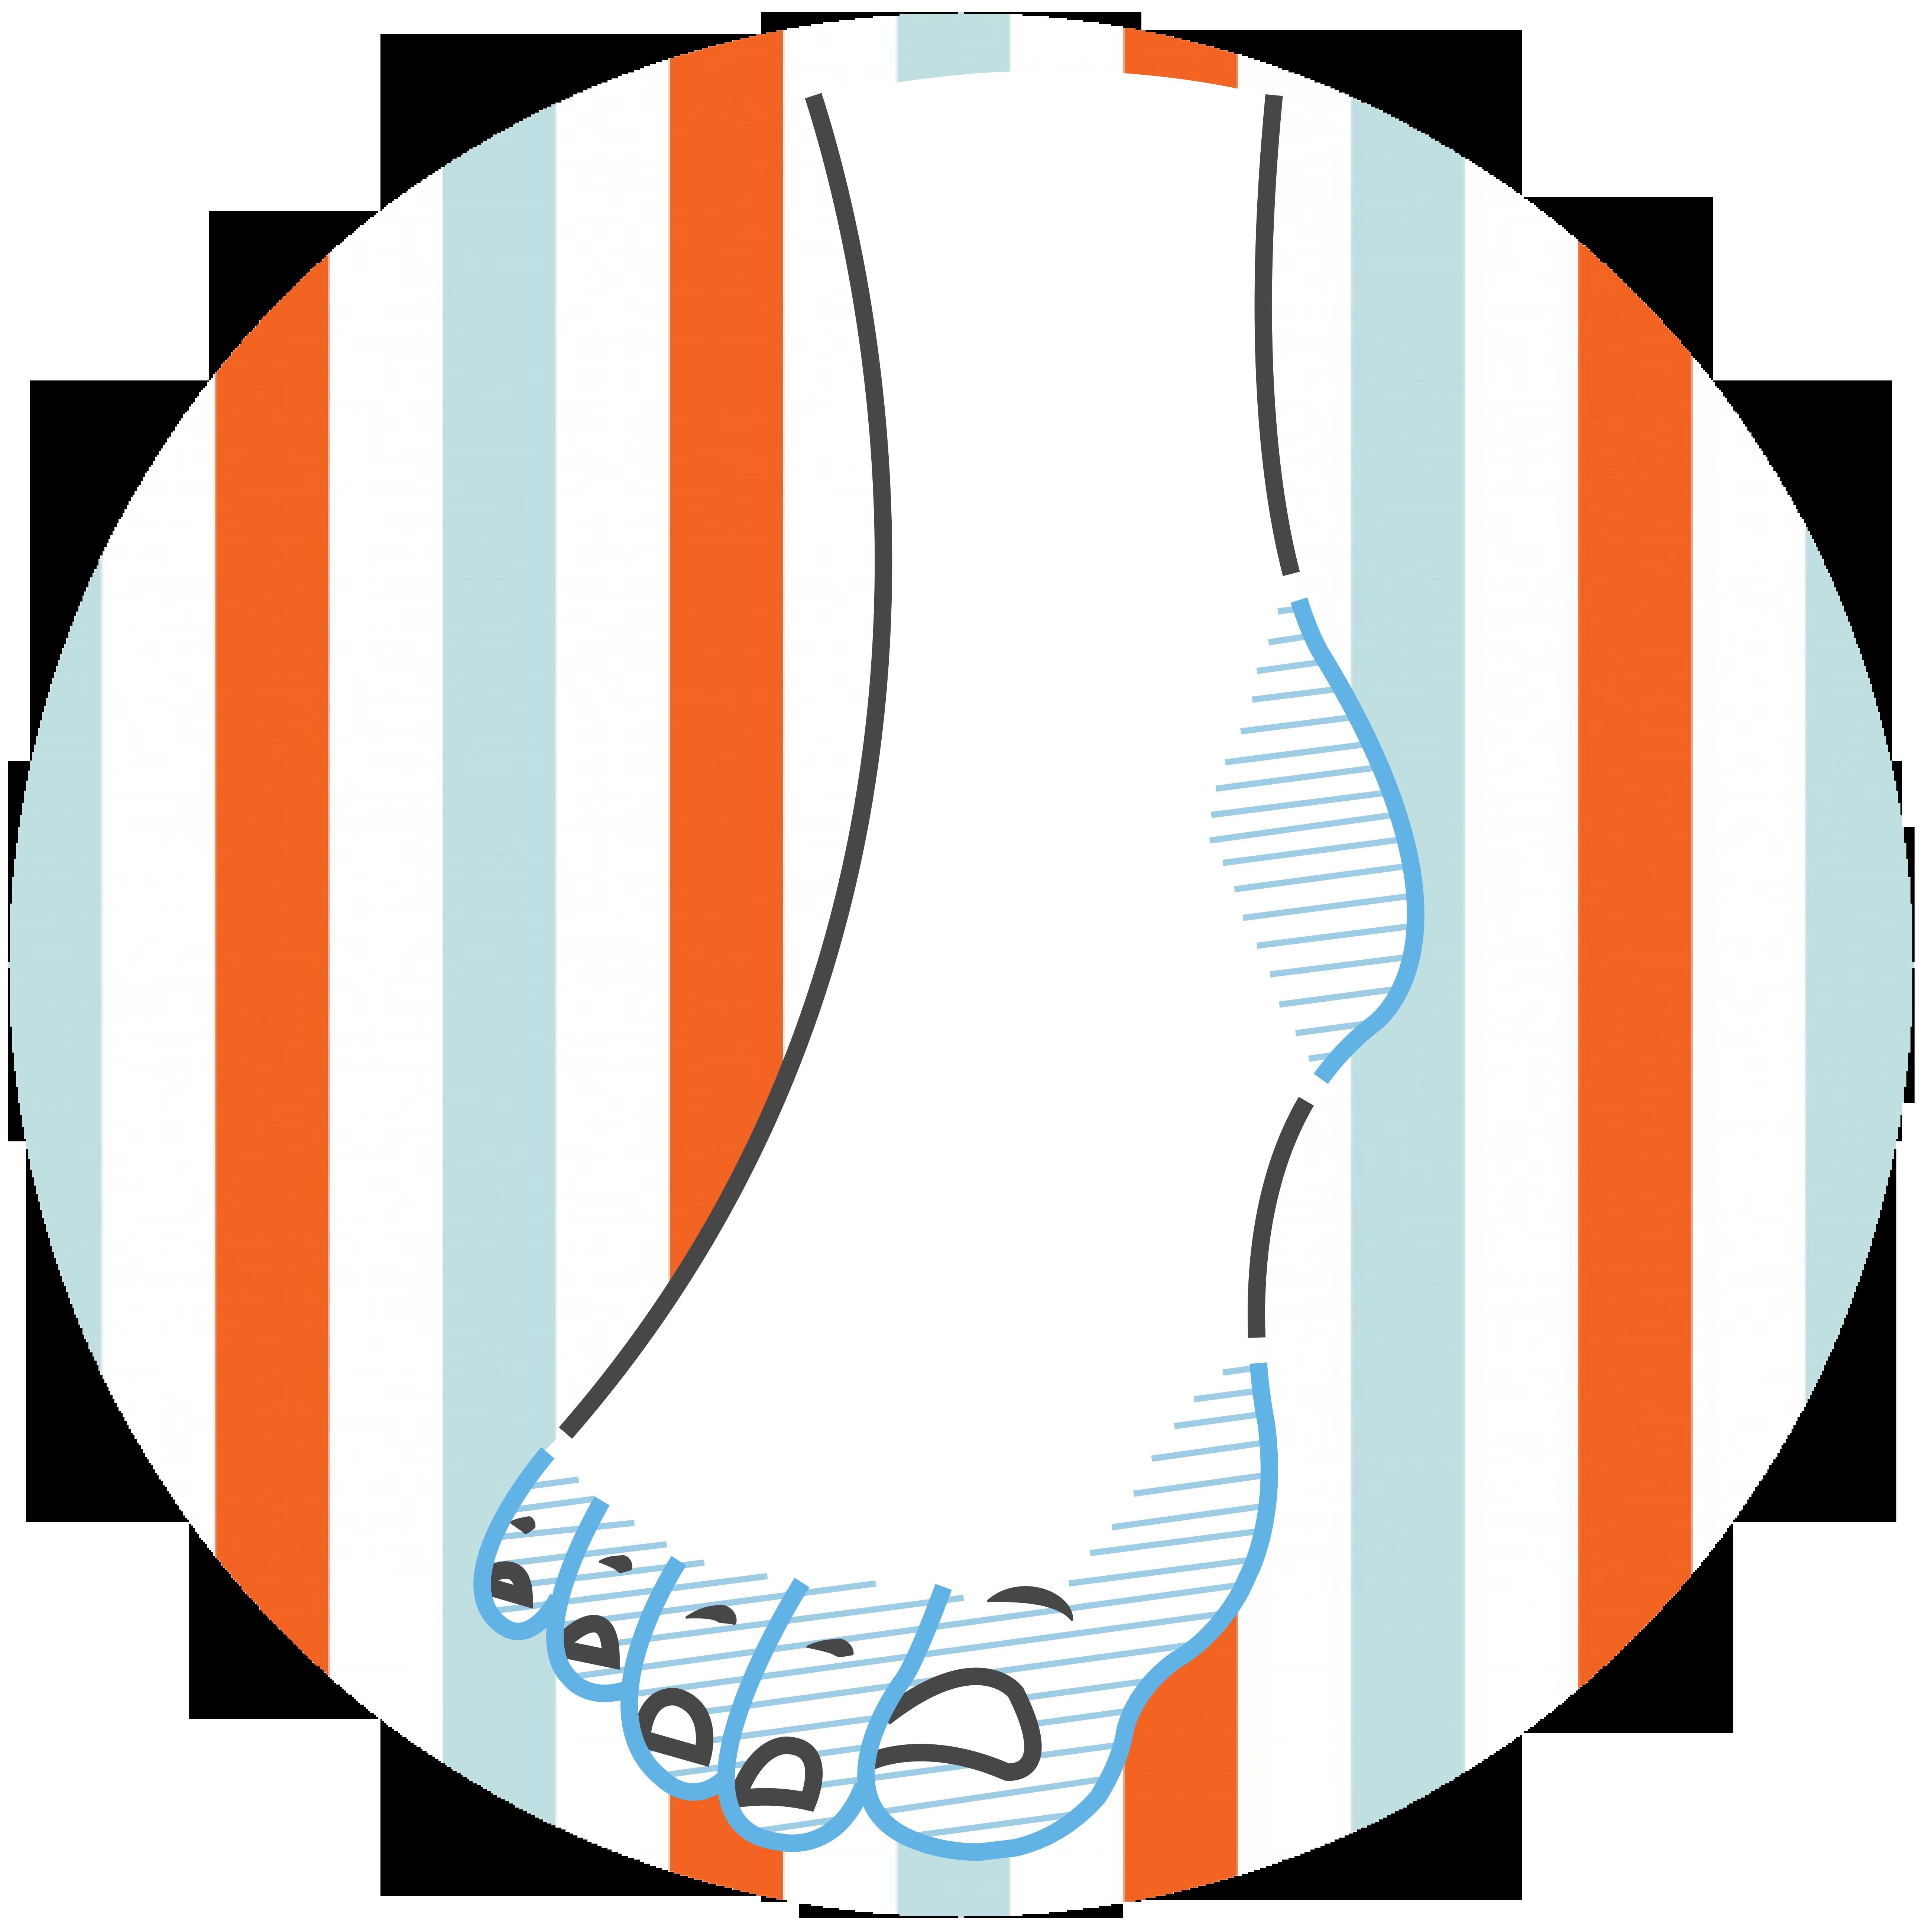 Nails clipart toe nail. Foot pain feetwise